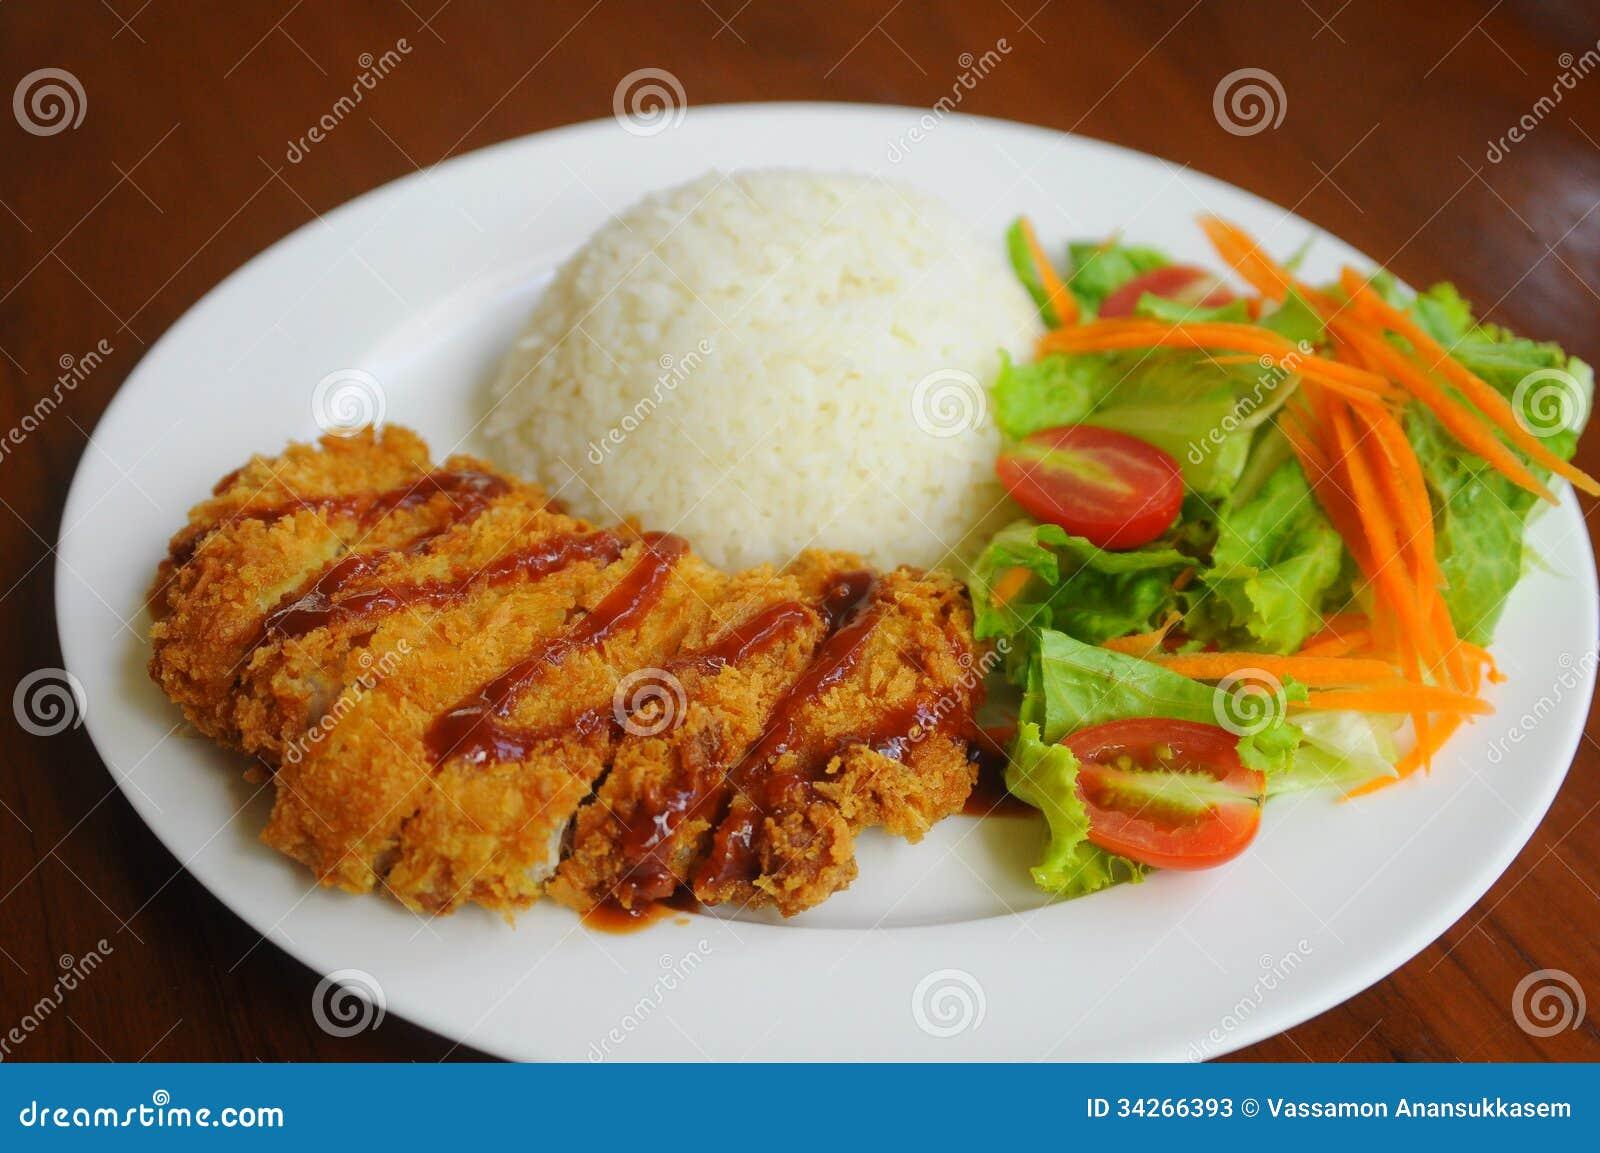 Deep Fried Pork With Rice And Salad